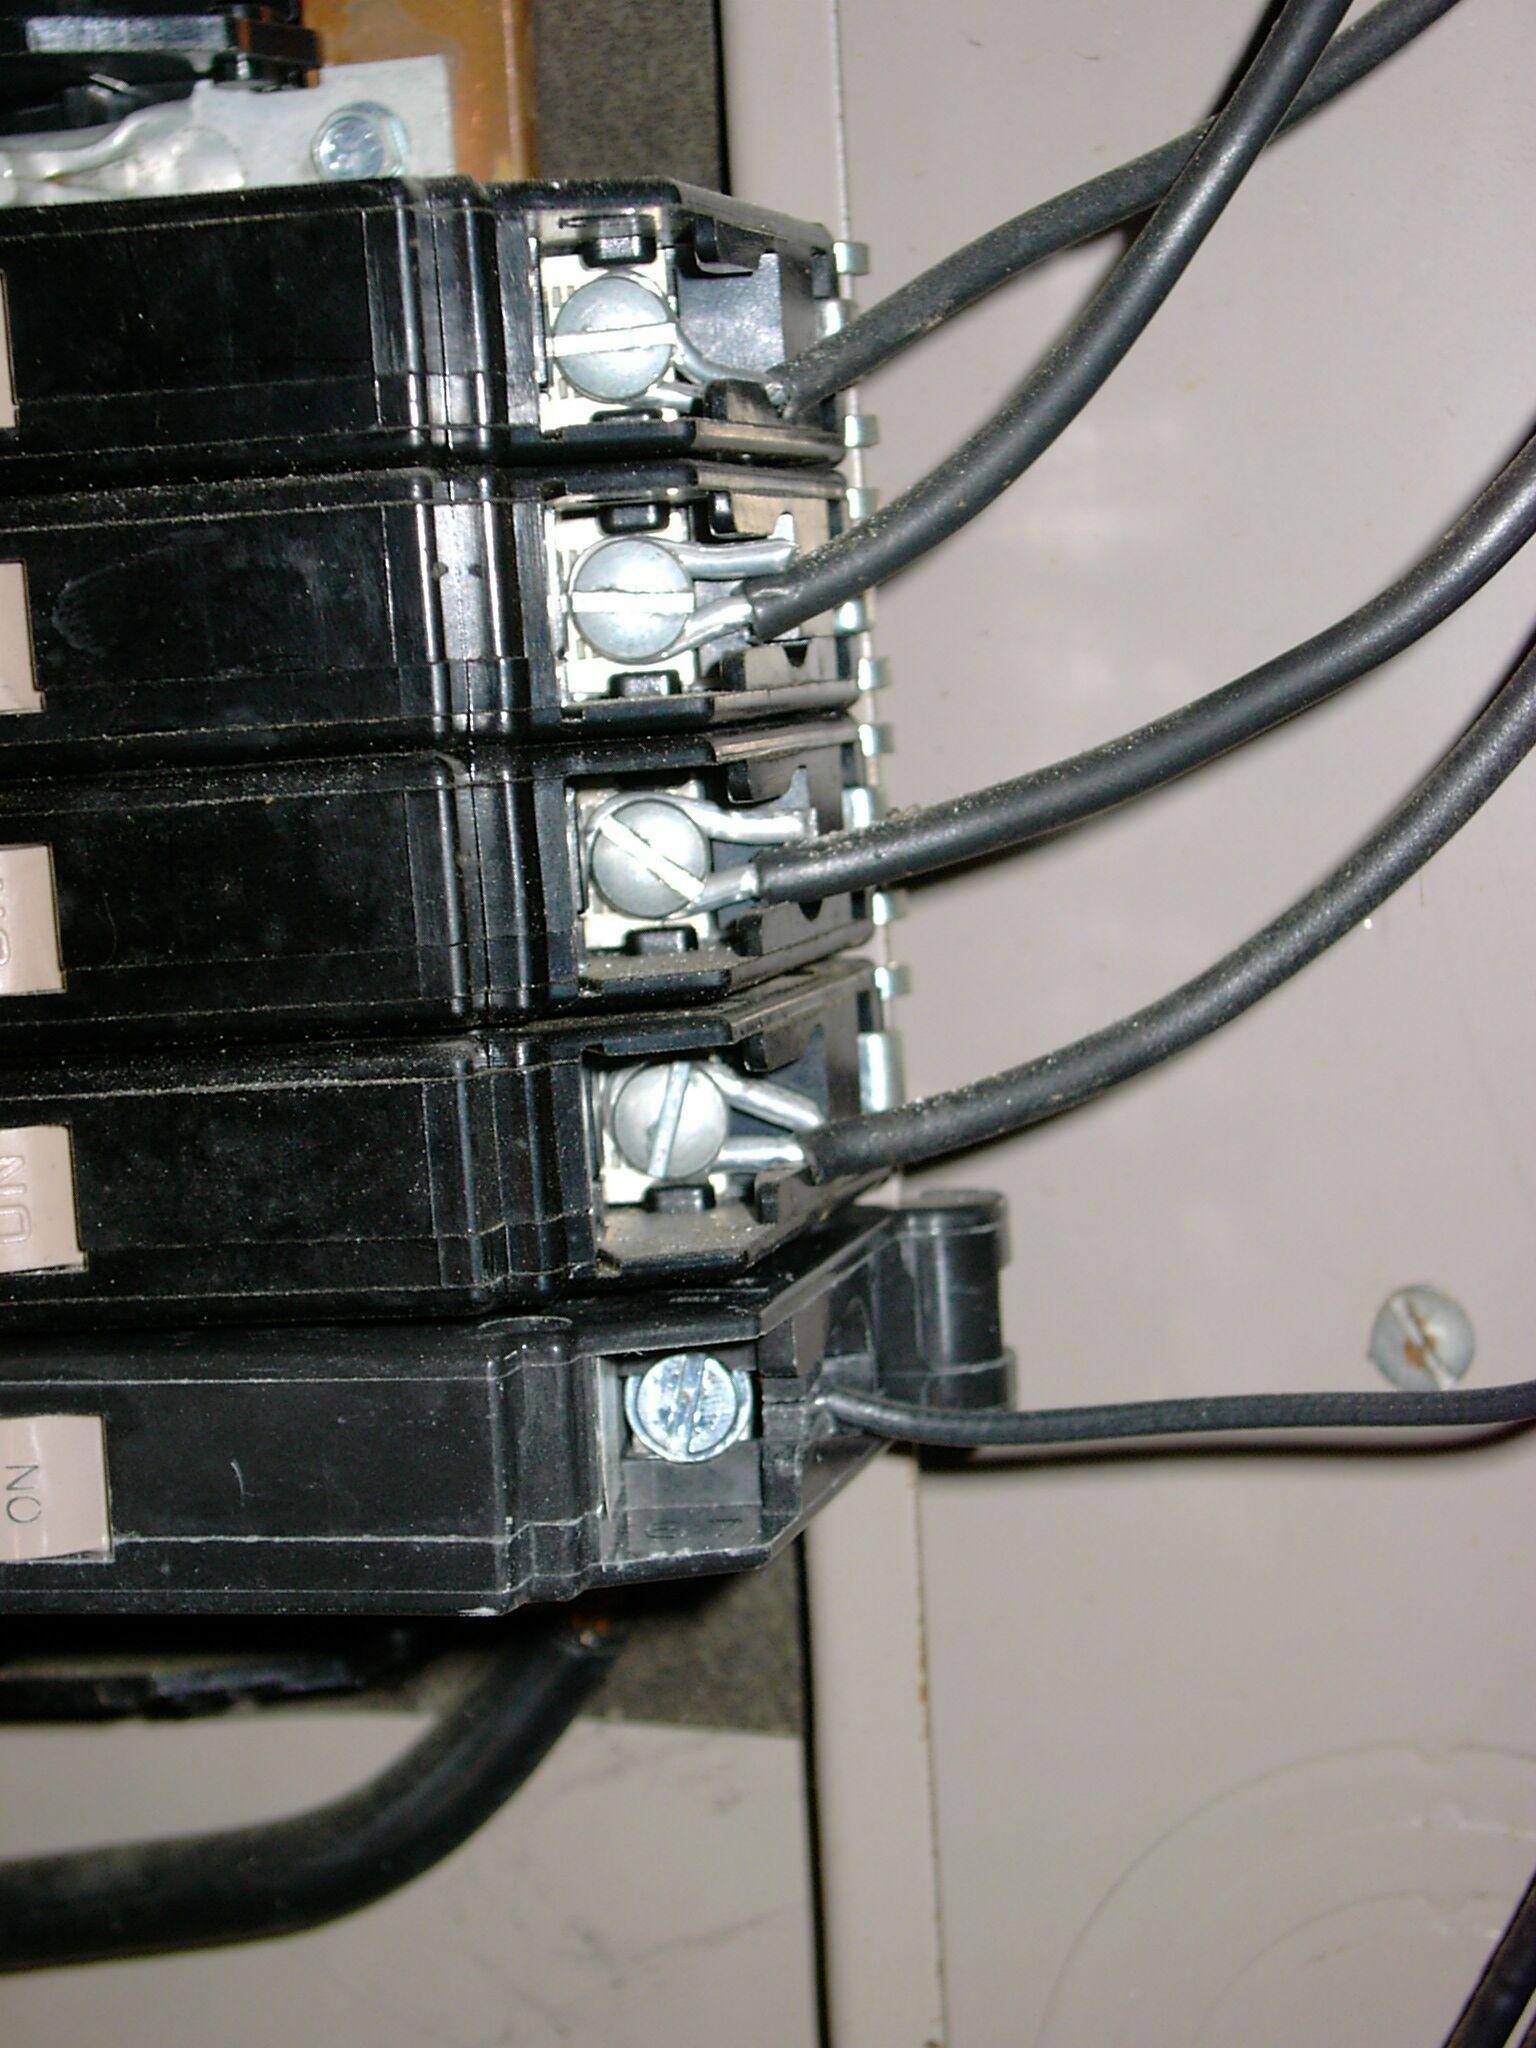 hight resolution of aluminum wiring in residential properties hazards remedies